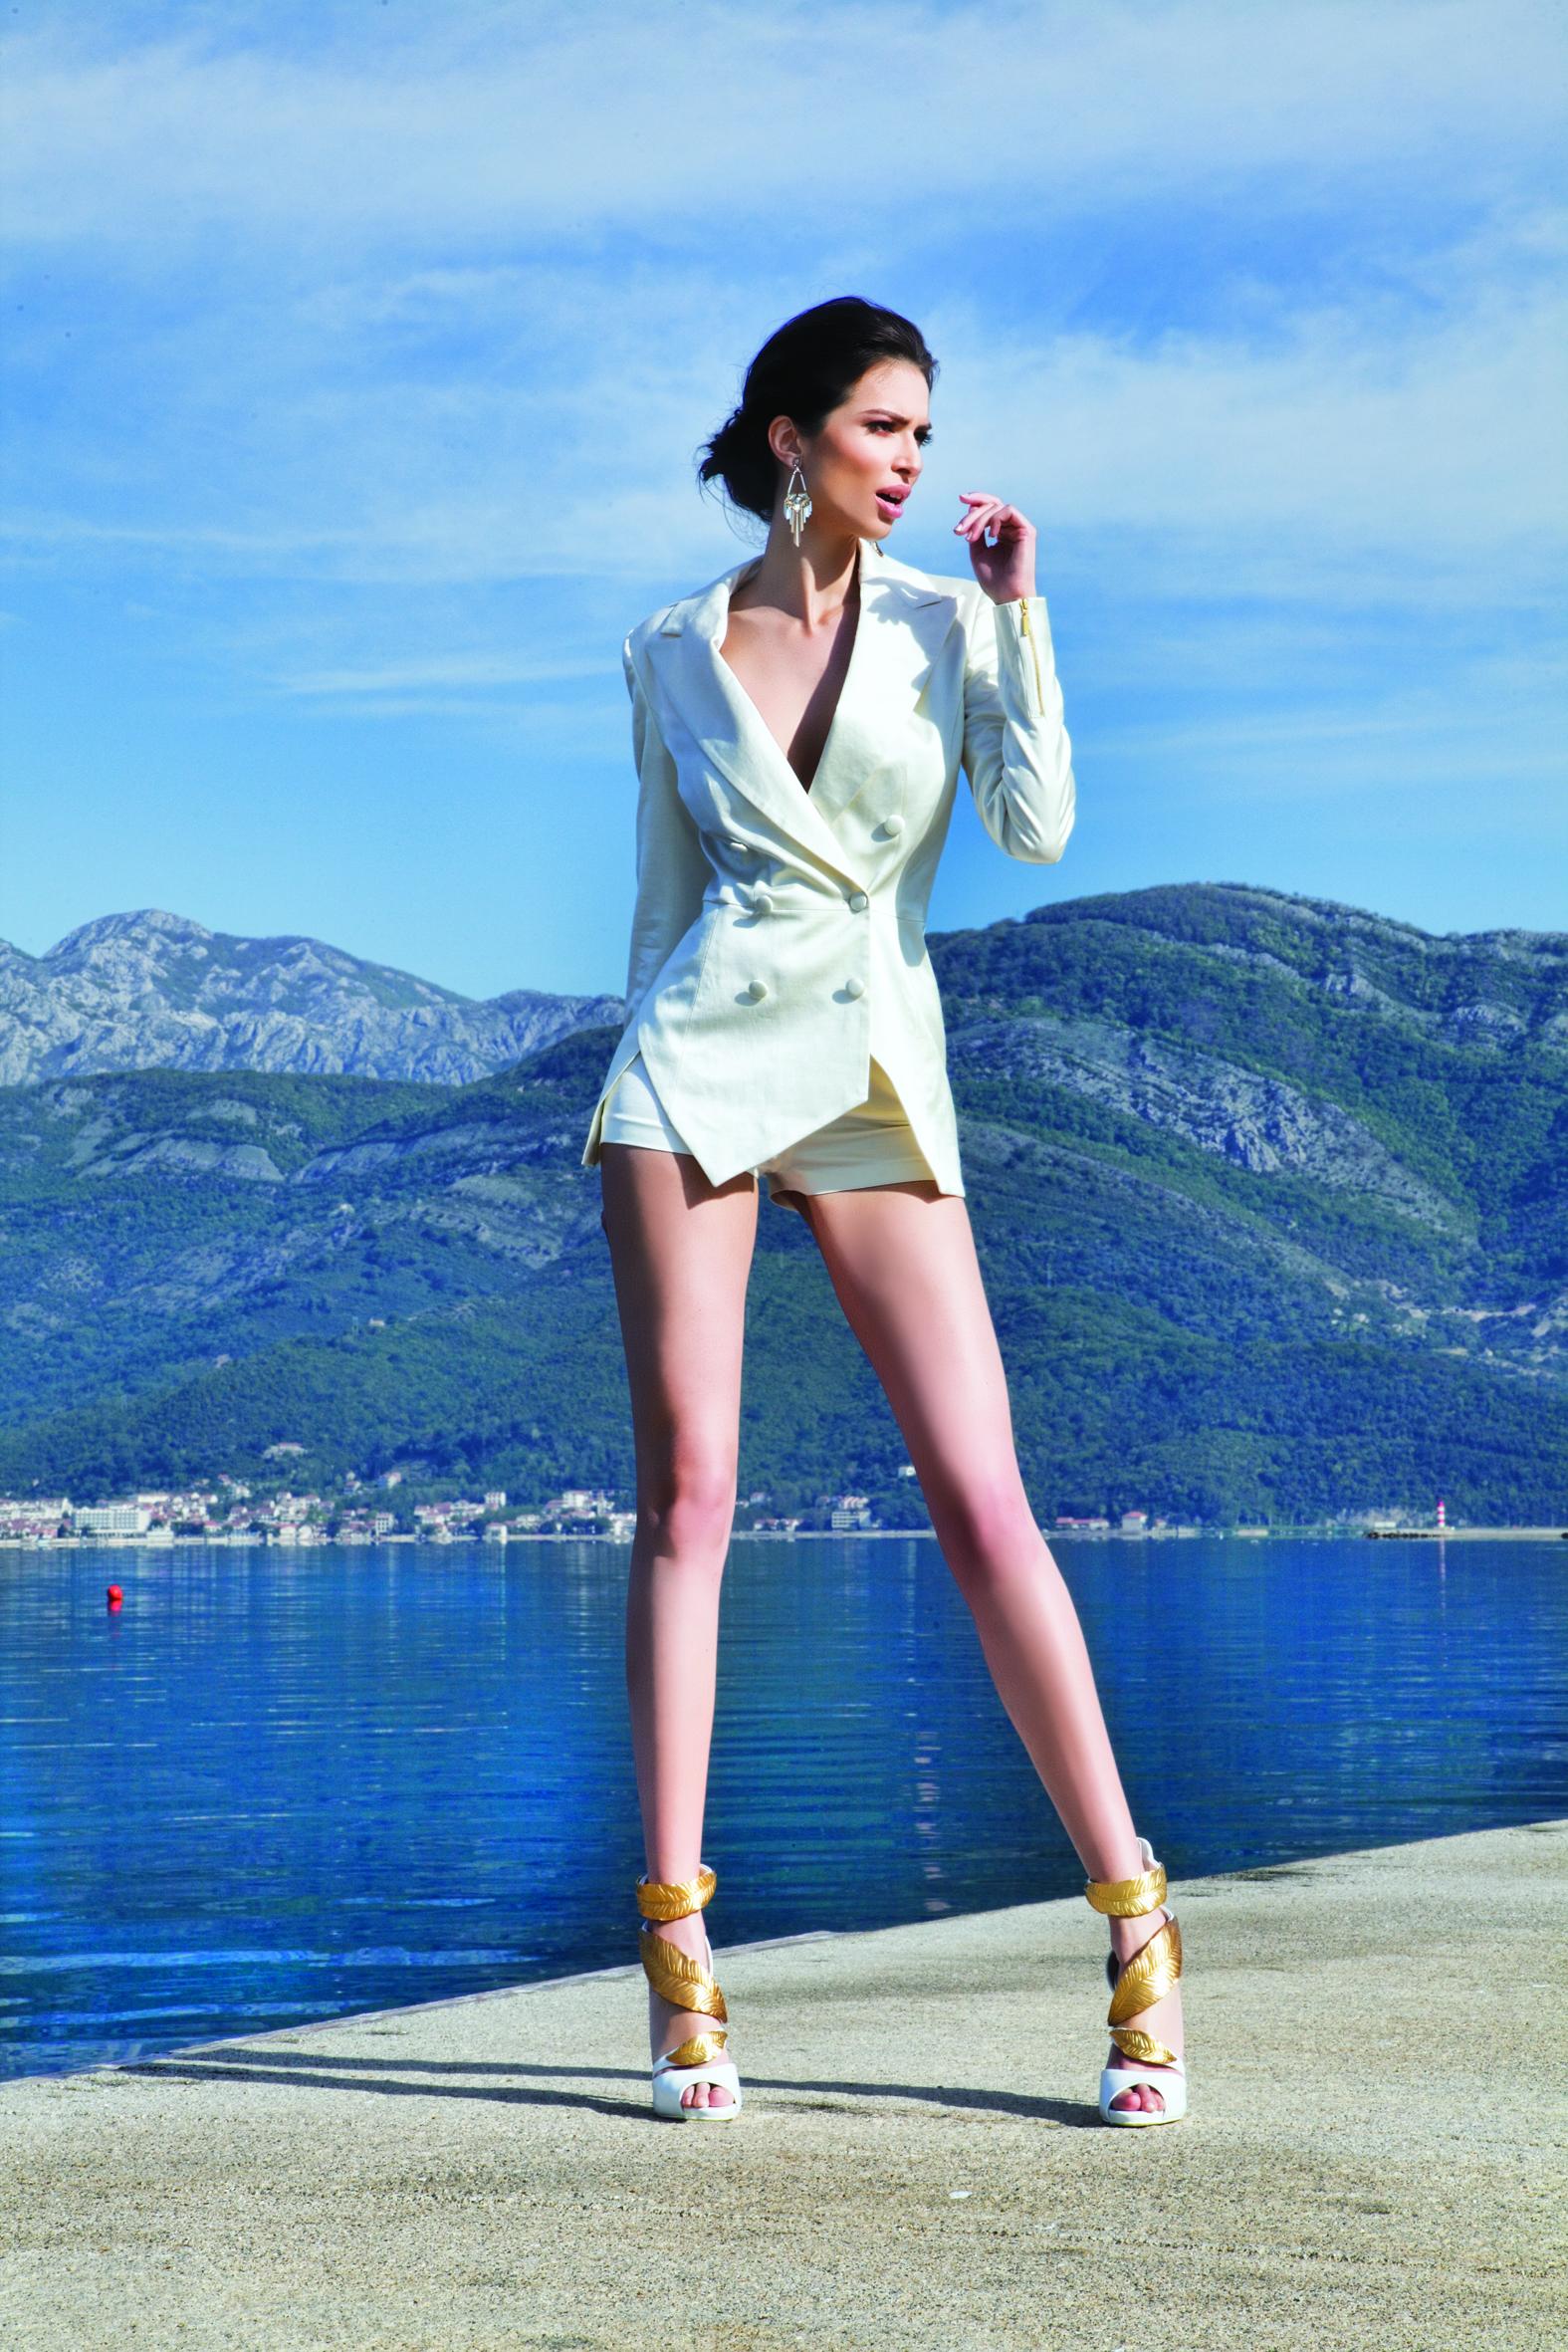 mg 9295 Ekskluzivna modna kolekcija: La Storia di una donna